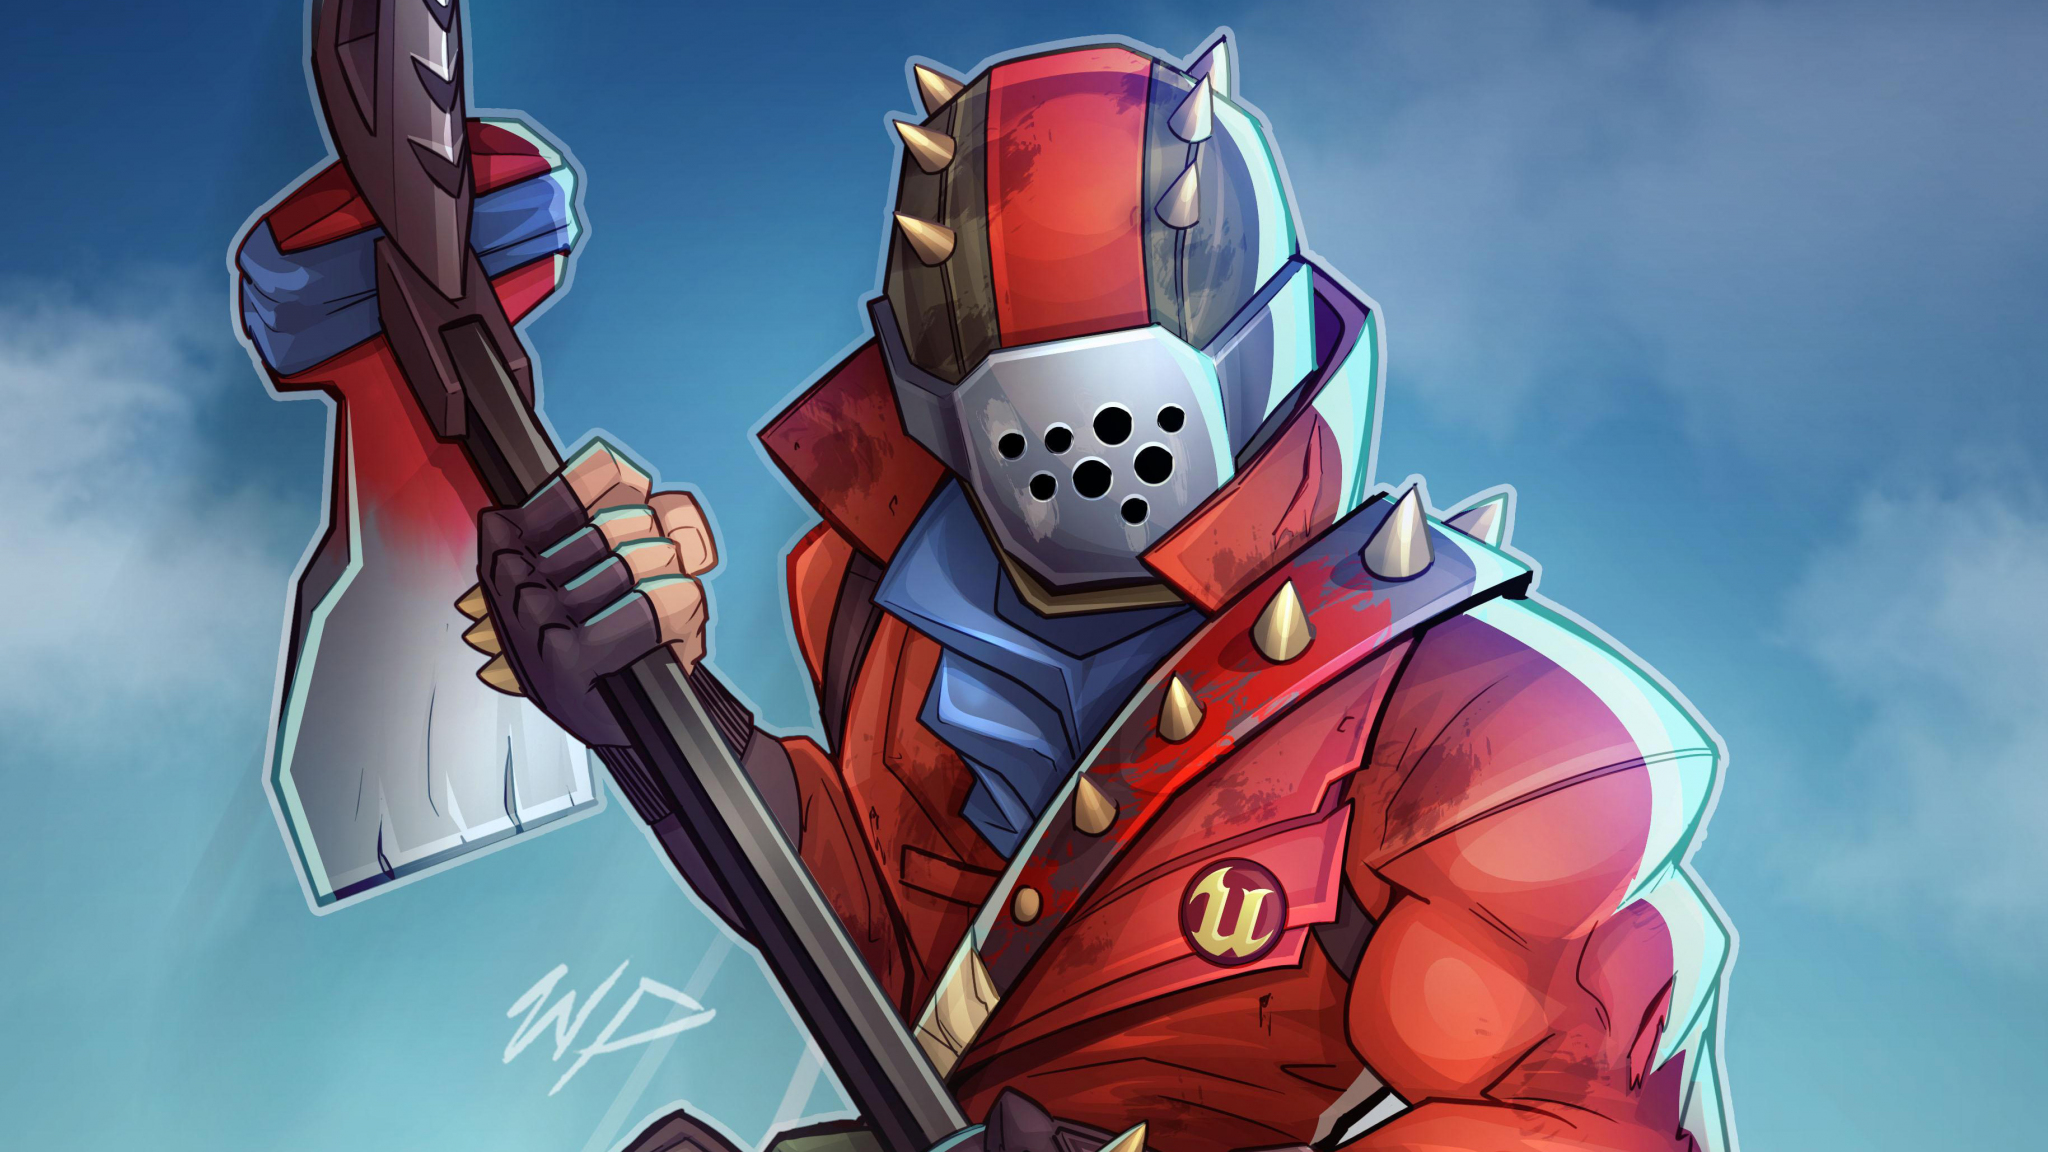 Fortnite Battle Royale Game Wallpaper 62258 1920x1080 Px